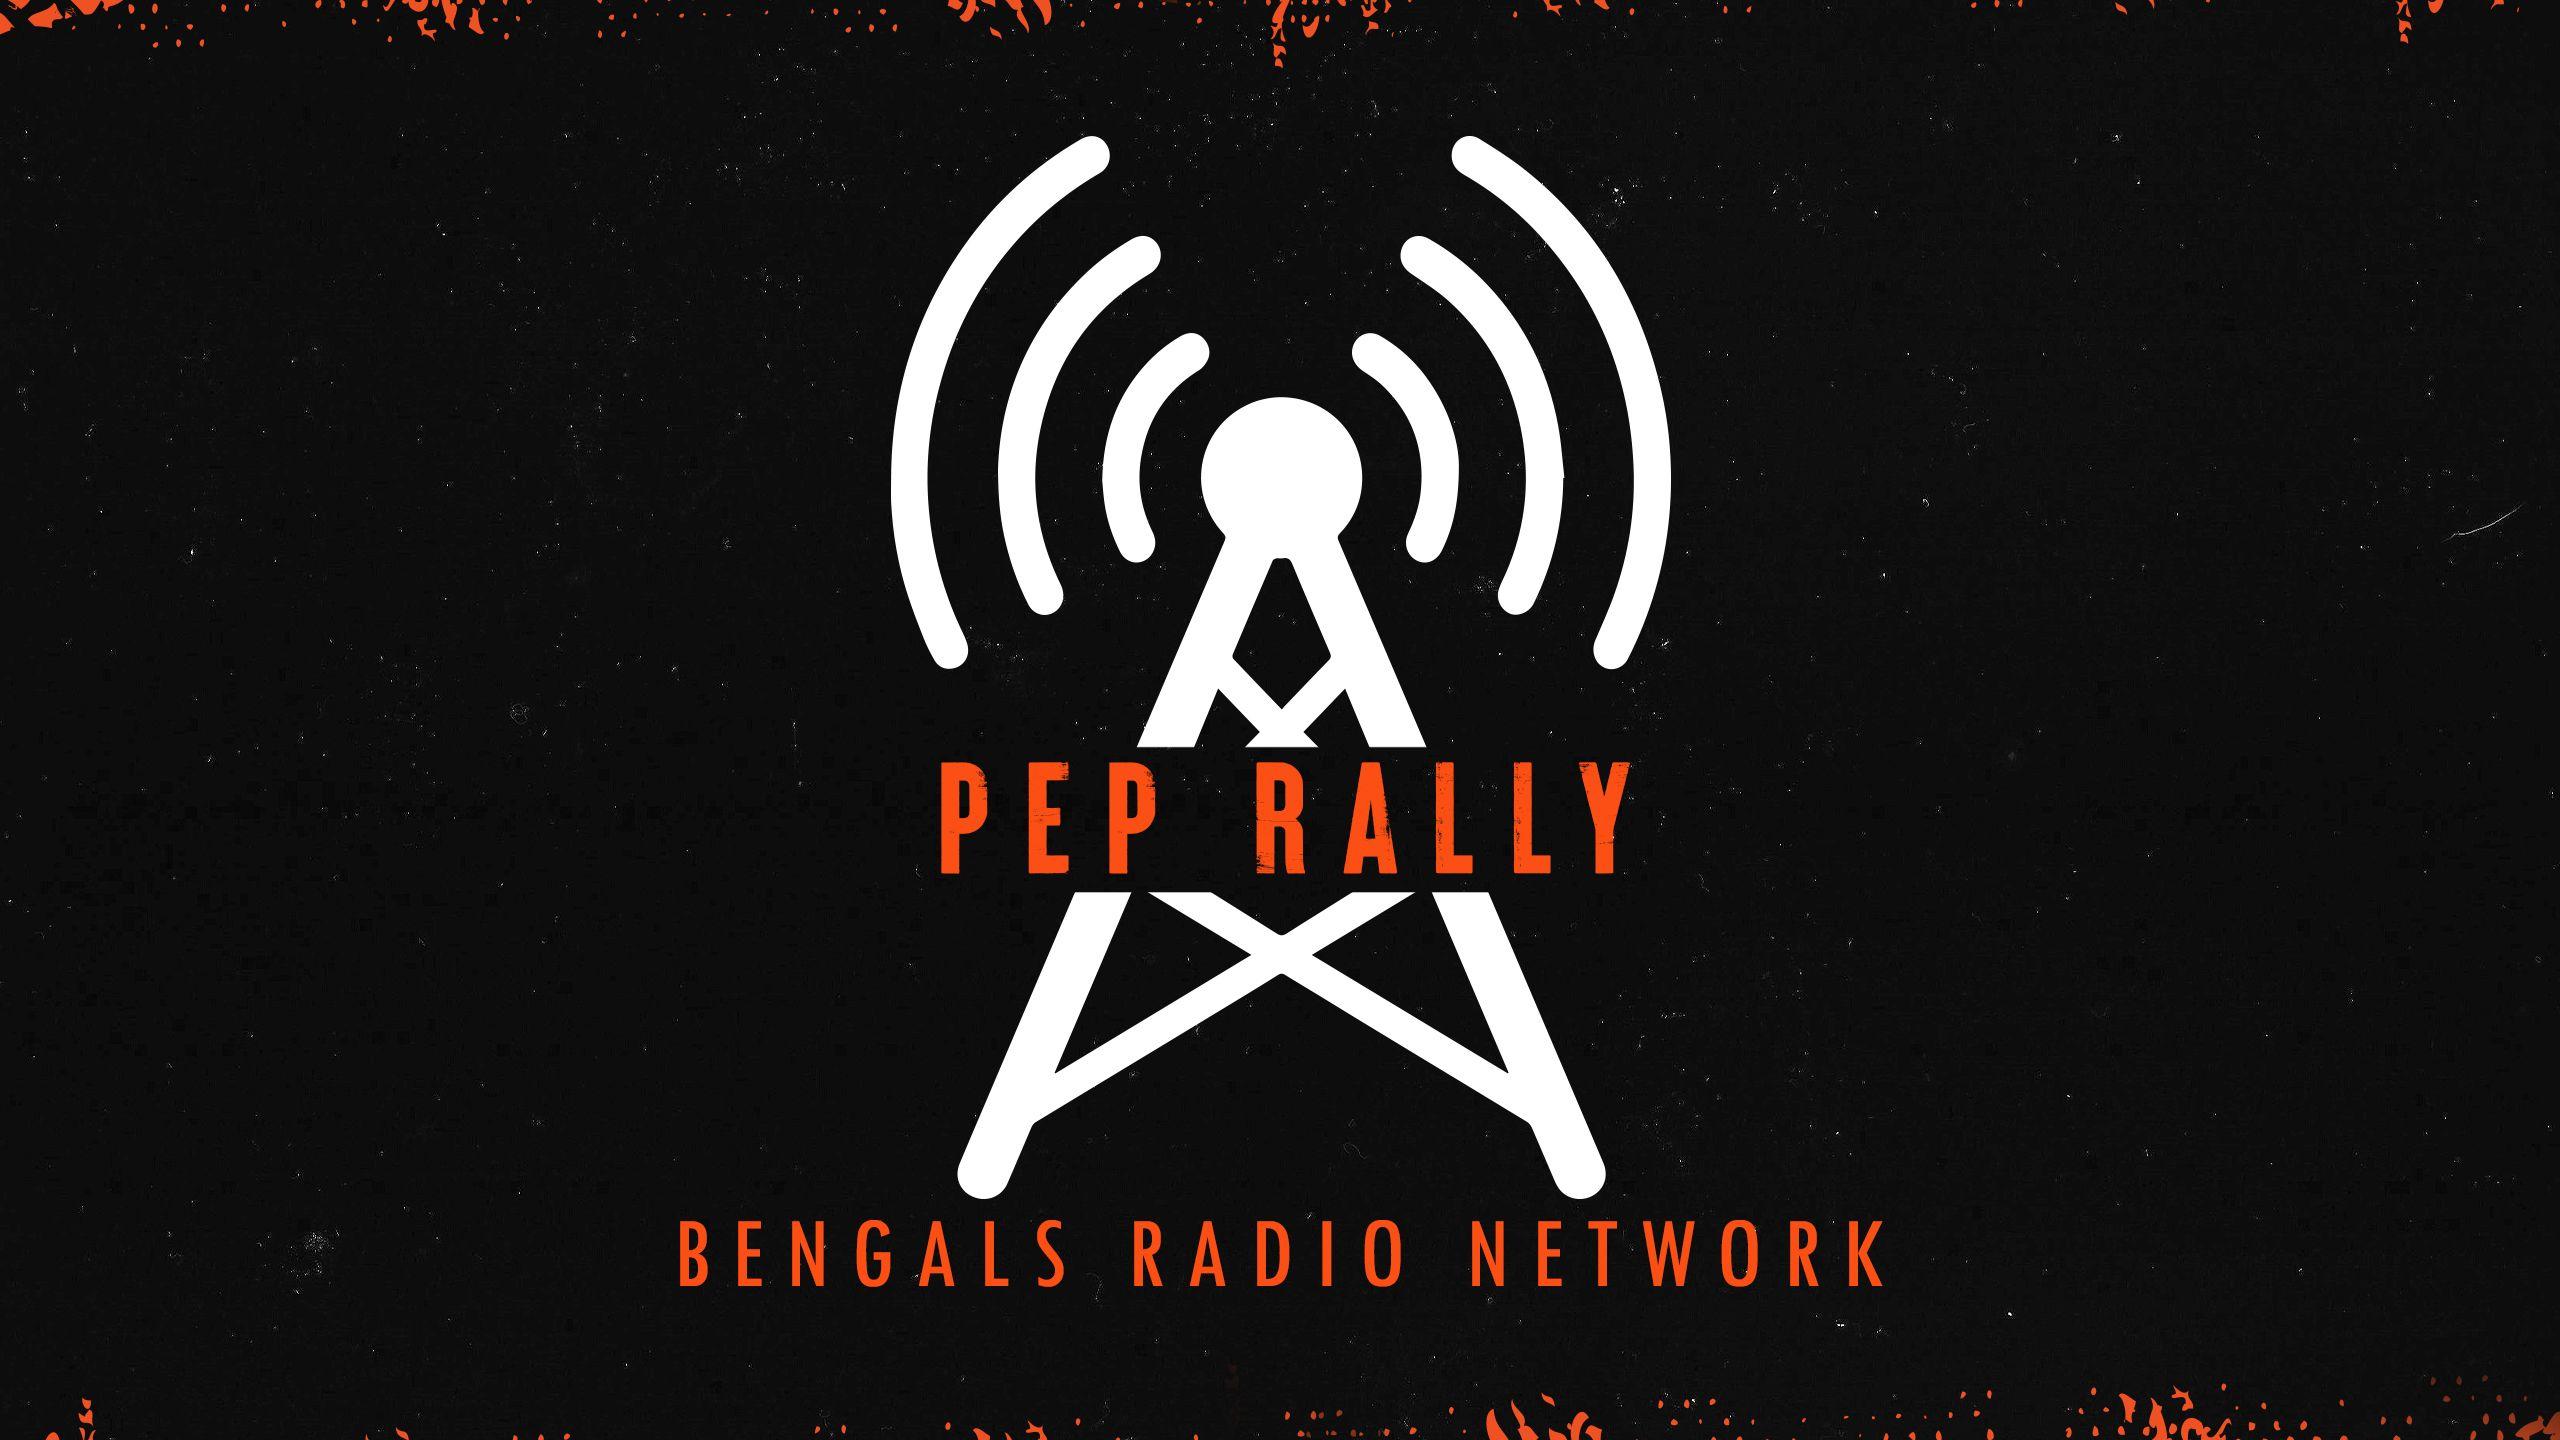 200804-bengals-pep-rally